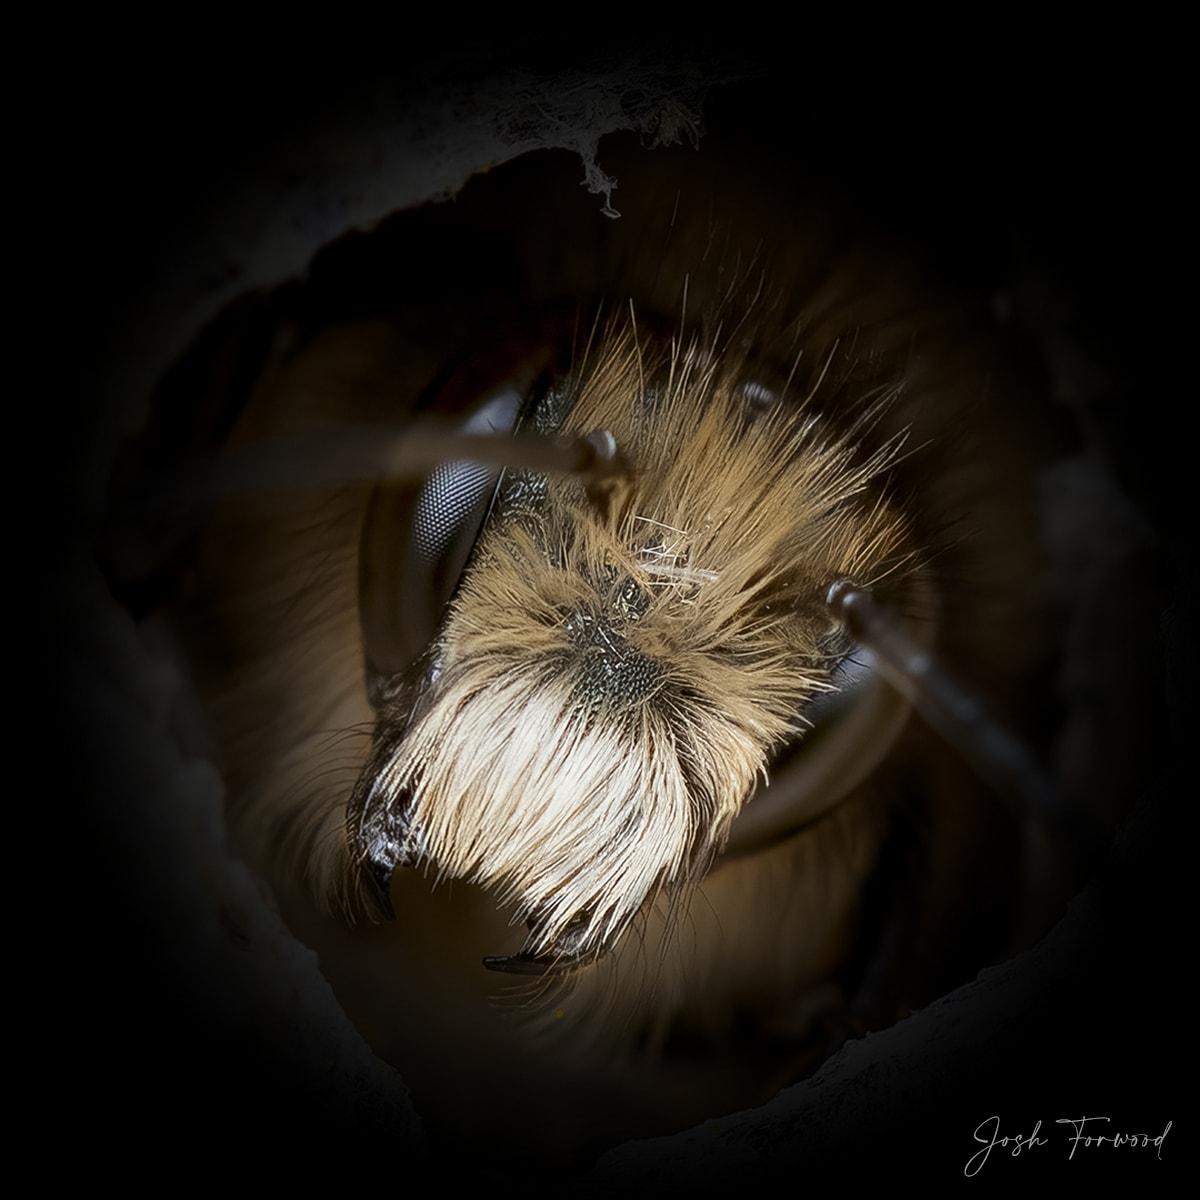 JoshForwood Bees 008